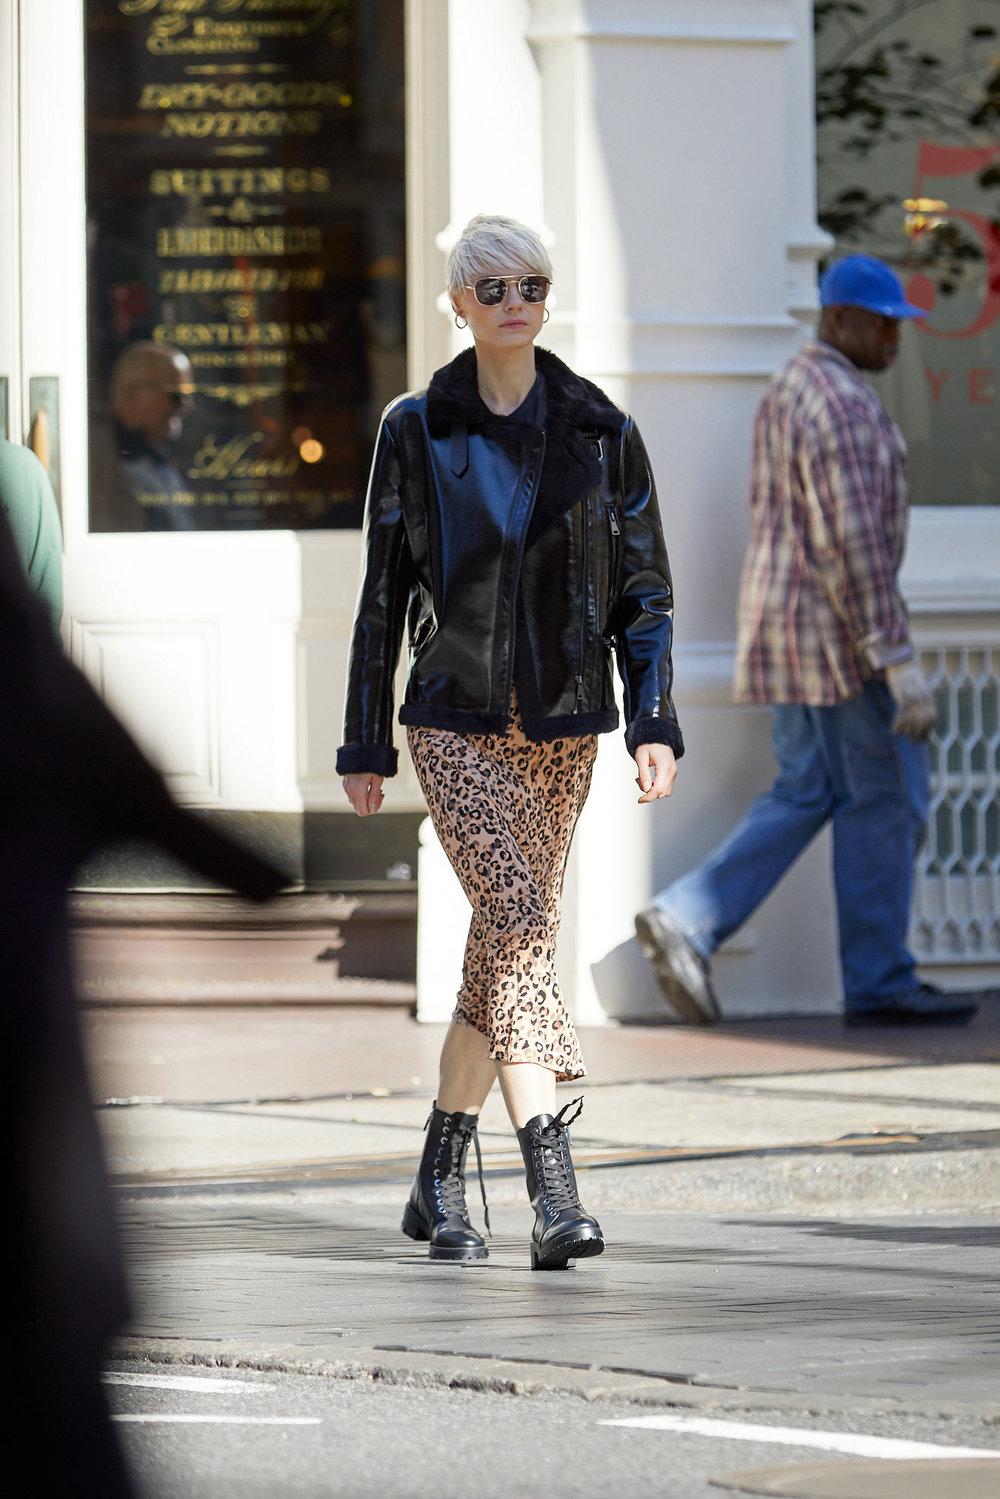 Danielle Vinyl Shearling Biker Jacket With Belt & Midi A-Line Skirt - Leopard Print & Harlem Hustler Sunglasses